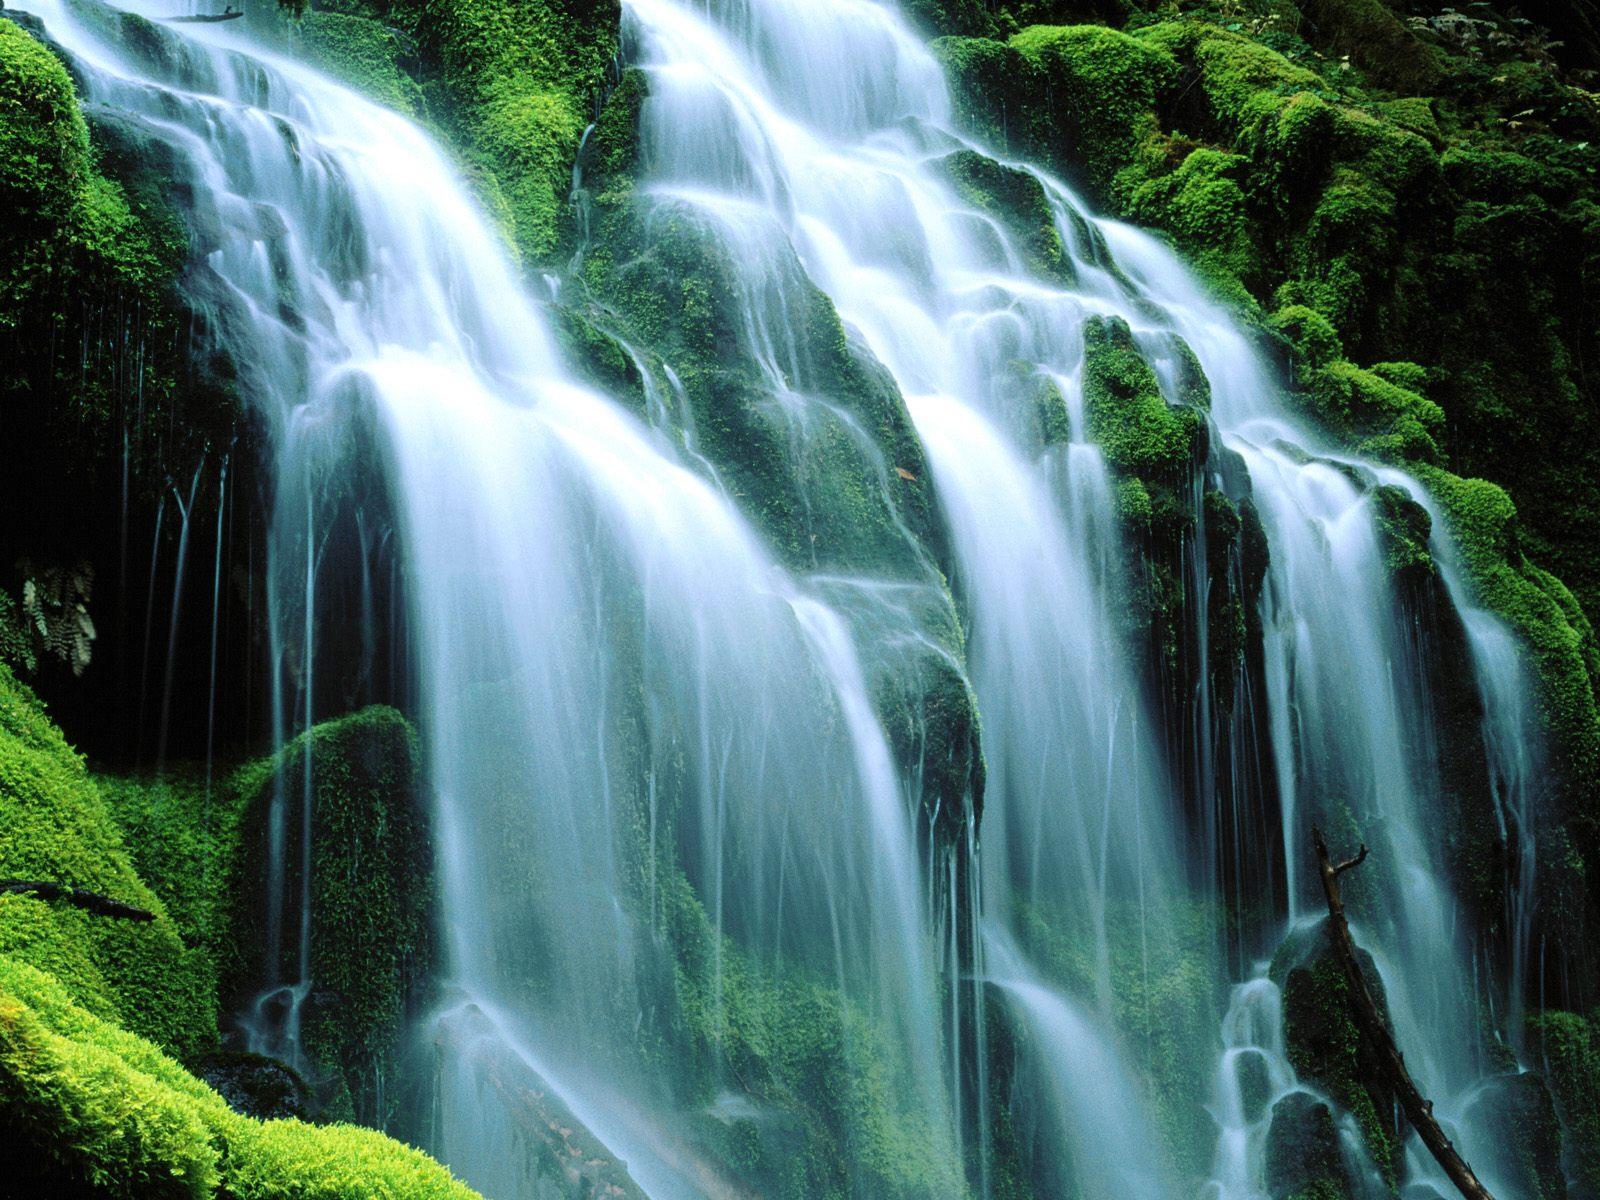 http://2.bp.blogspot.com/-tqVxAxN8KZg/TcmPjaa9baI/AAAAAAAAABs/J58Mmx5ZPnY/s1600/Waterfall-Wallpapers-Pack+%252820%2529.jpg